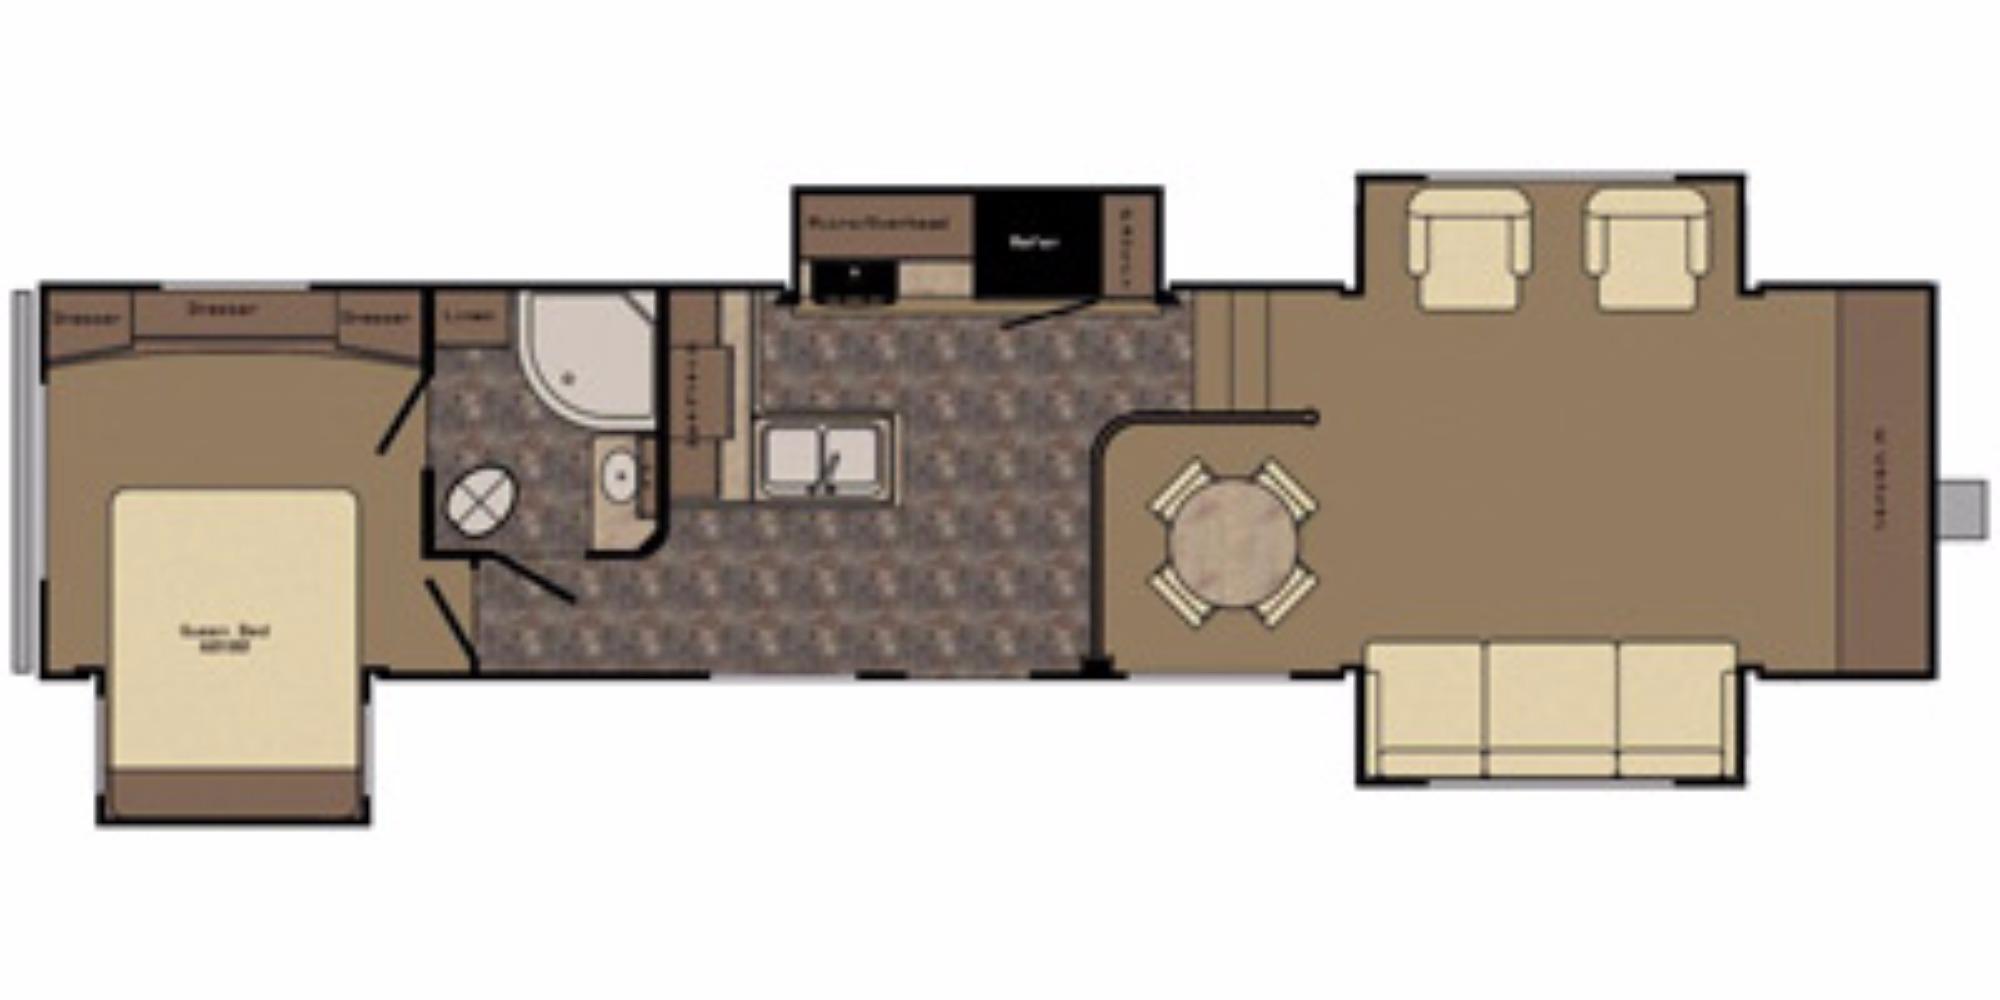 View Floor Plan for 2015 CROSSROADS CRUISER 362FL